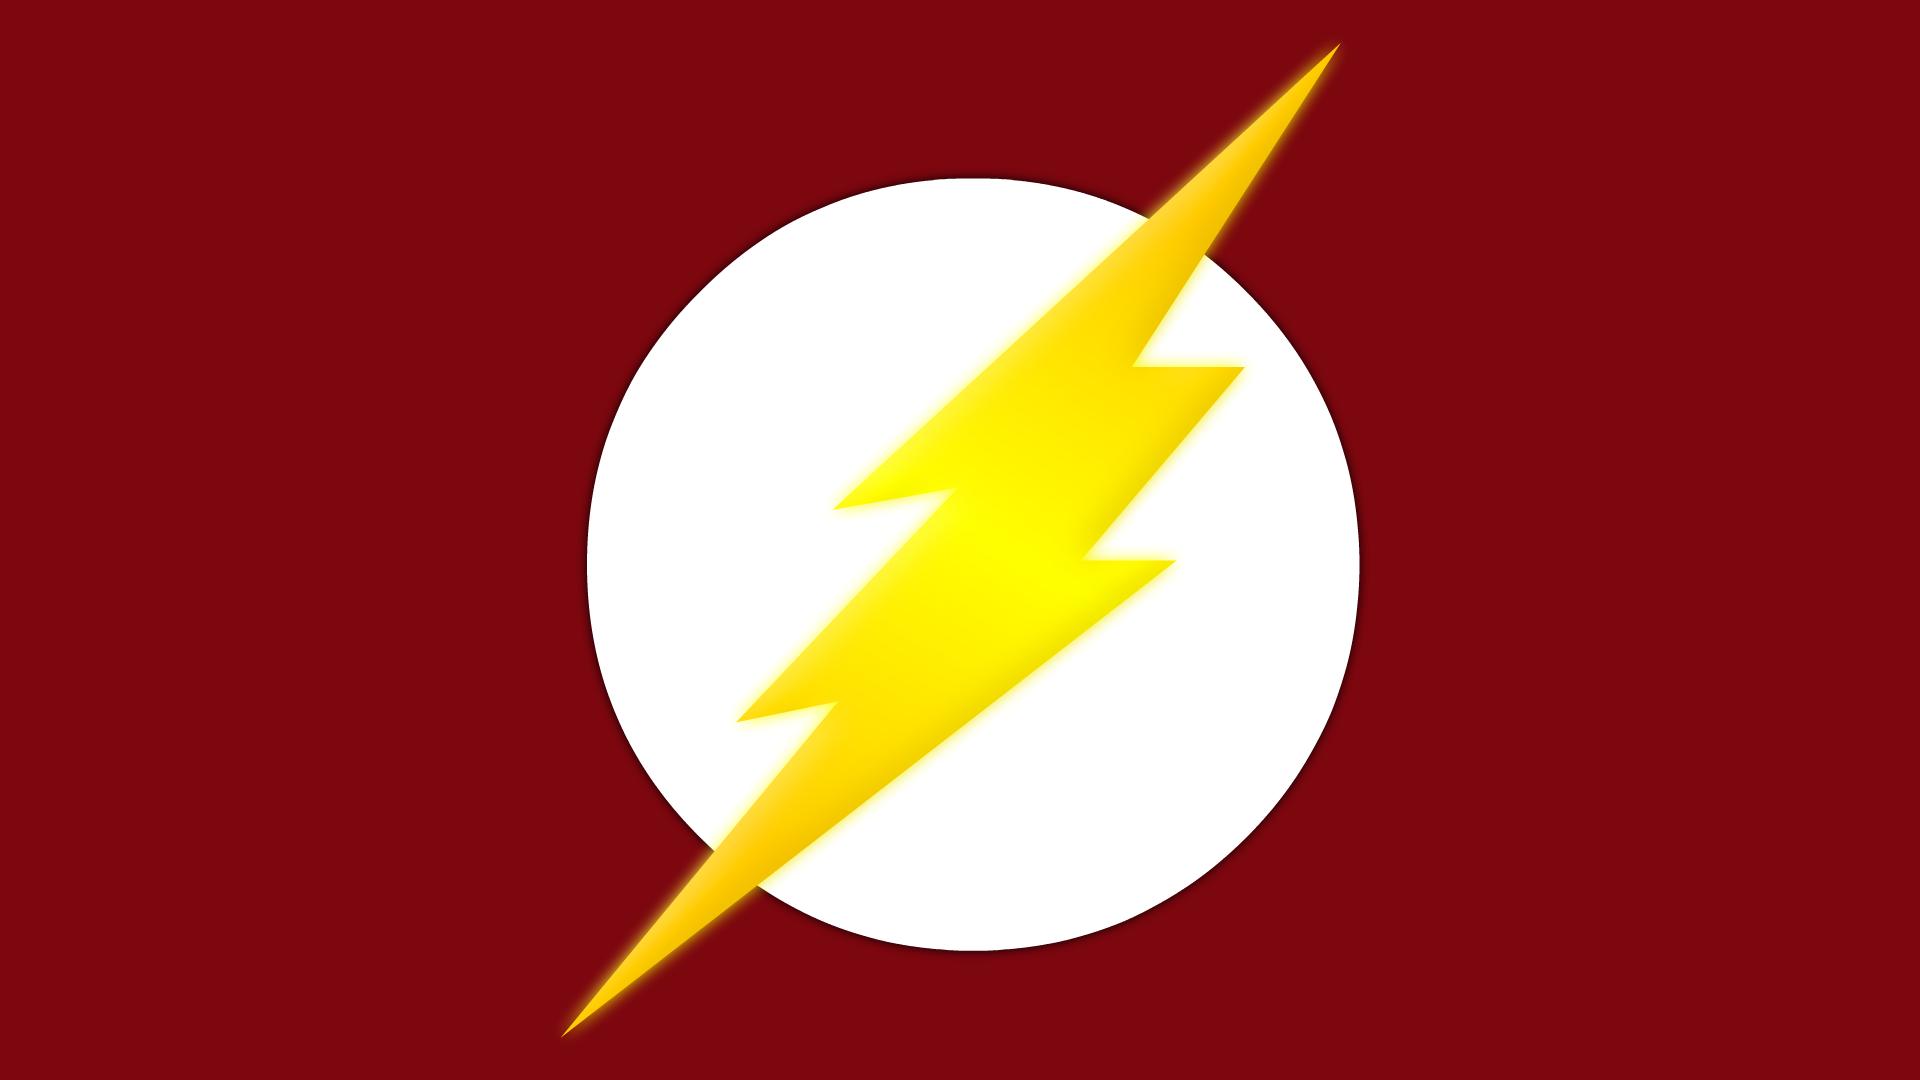 The Flash Symbol By Yurtigo On Deviantart Its like a small movie inside the flash movie you make ( a mini movie with the main movie). the flash symbol by yurtigo on deviantart